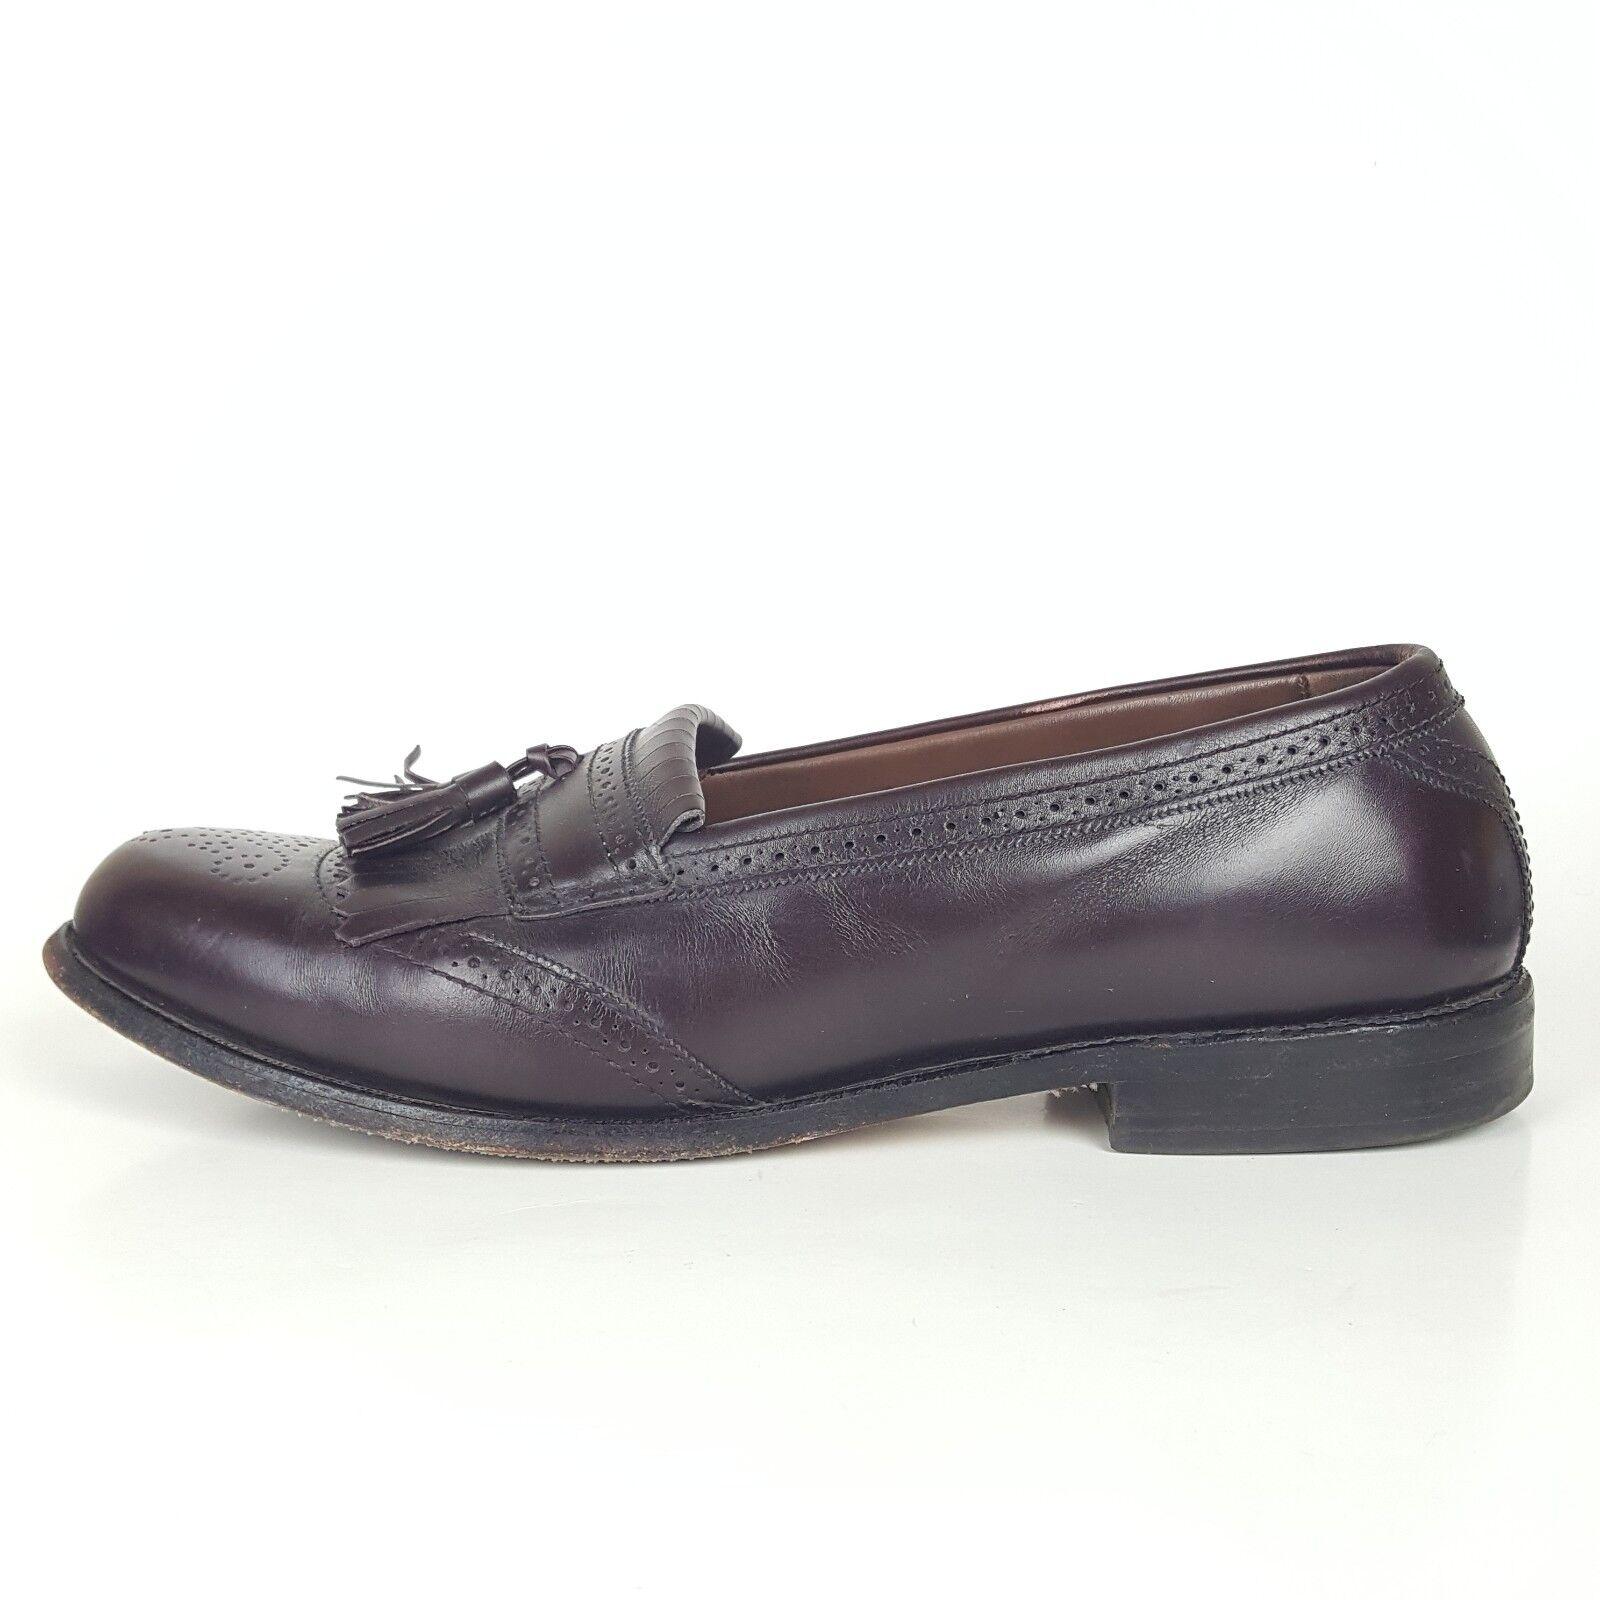 Allen Edmonds Leather Mens Loafers Bridgeton Burgundy Leather Edmonds Slip On Tassel10.5 C $295 5bcf6f